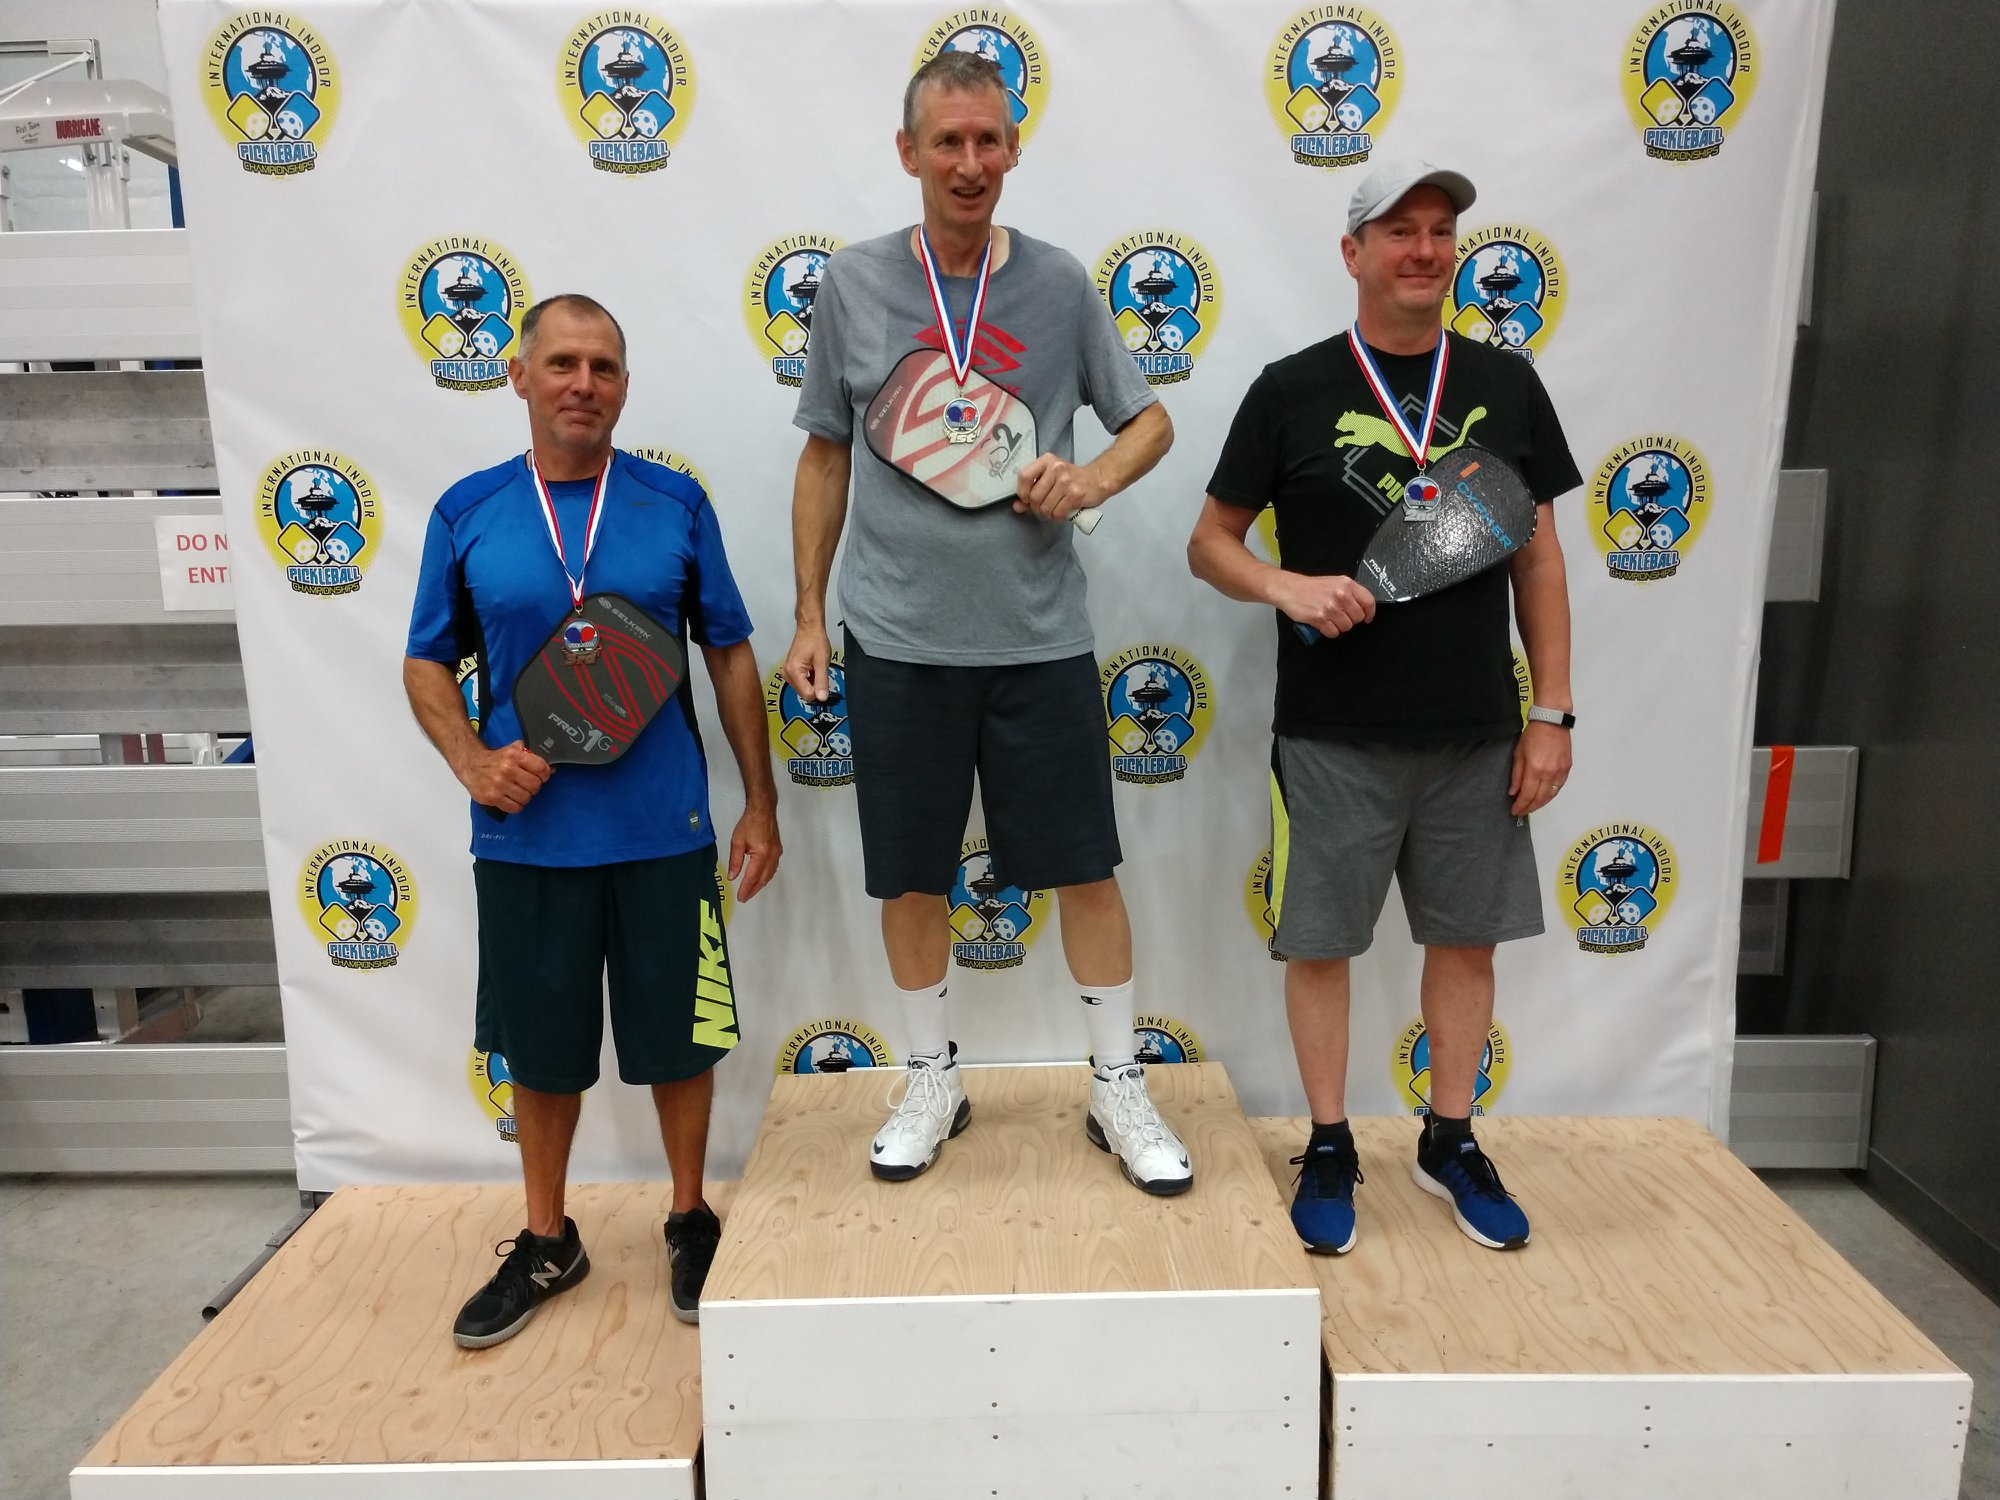 Men's Singles 4.0, 50+Arvo Johnson - Bronze